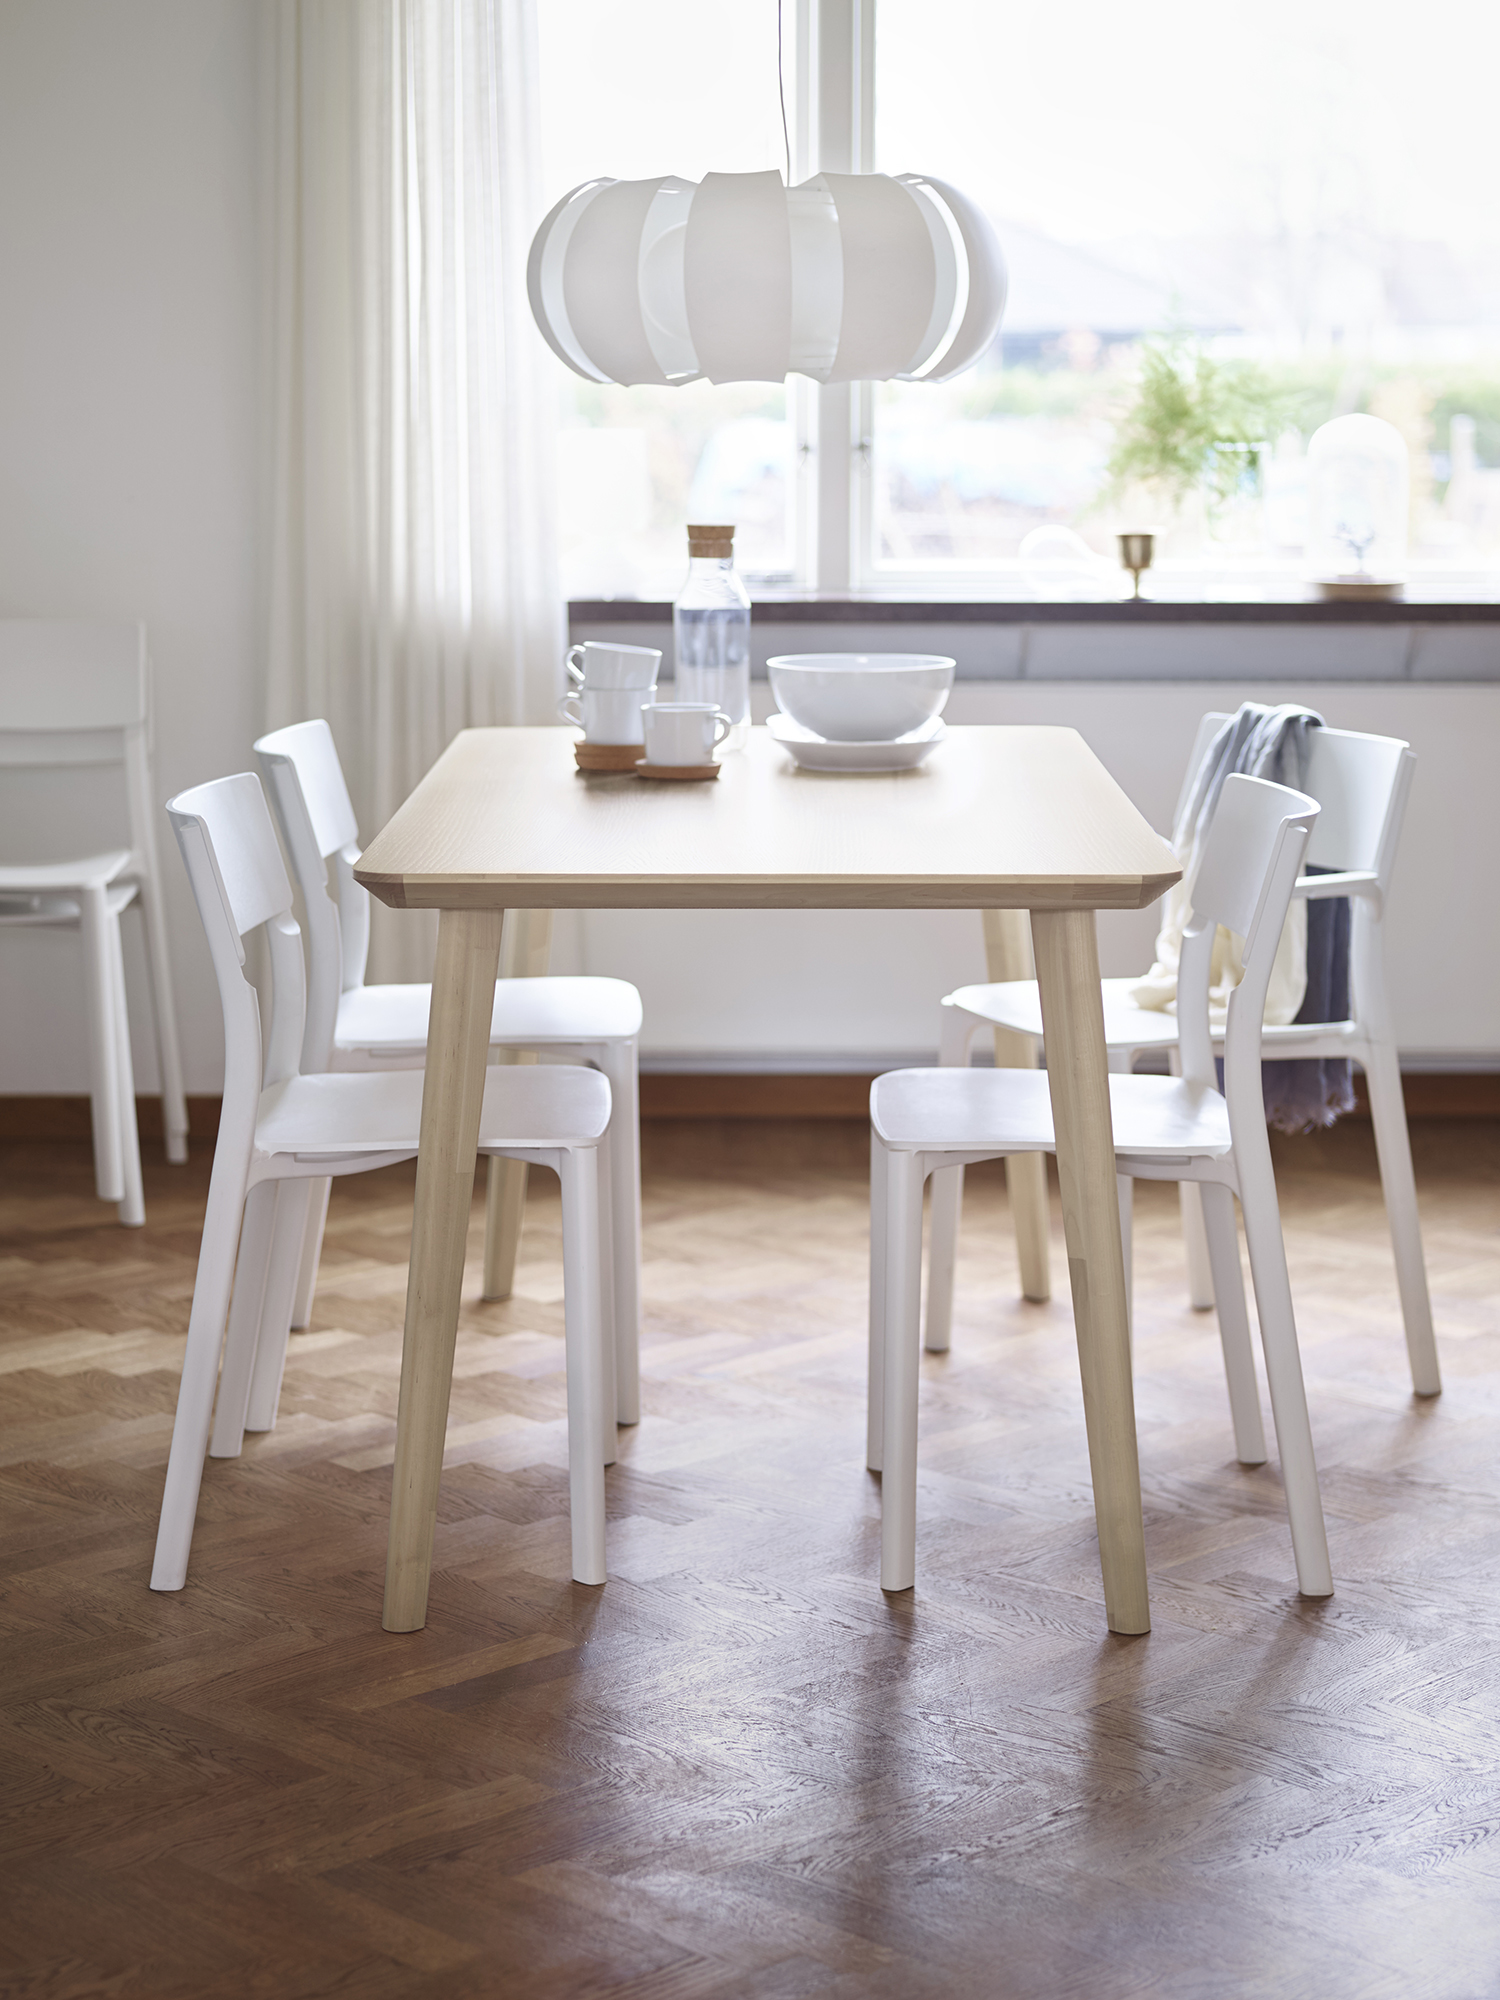 LISABO Matbord IKEA - fixaodona.se